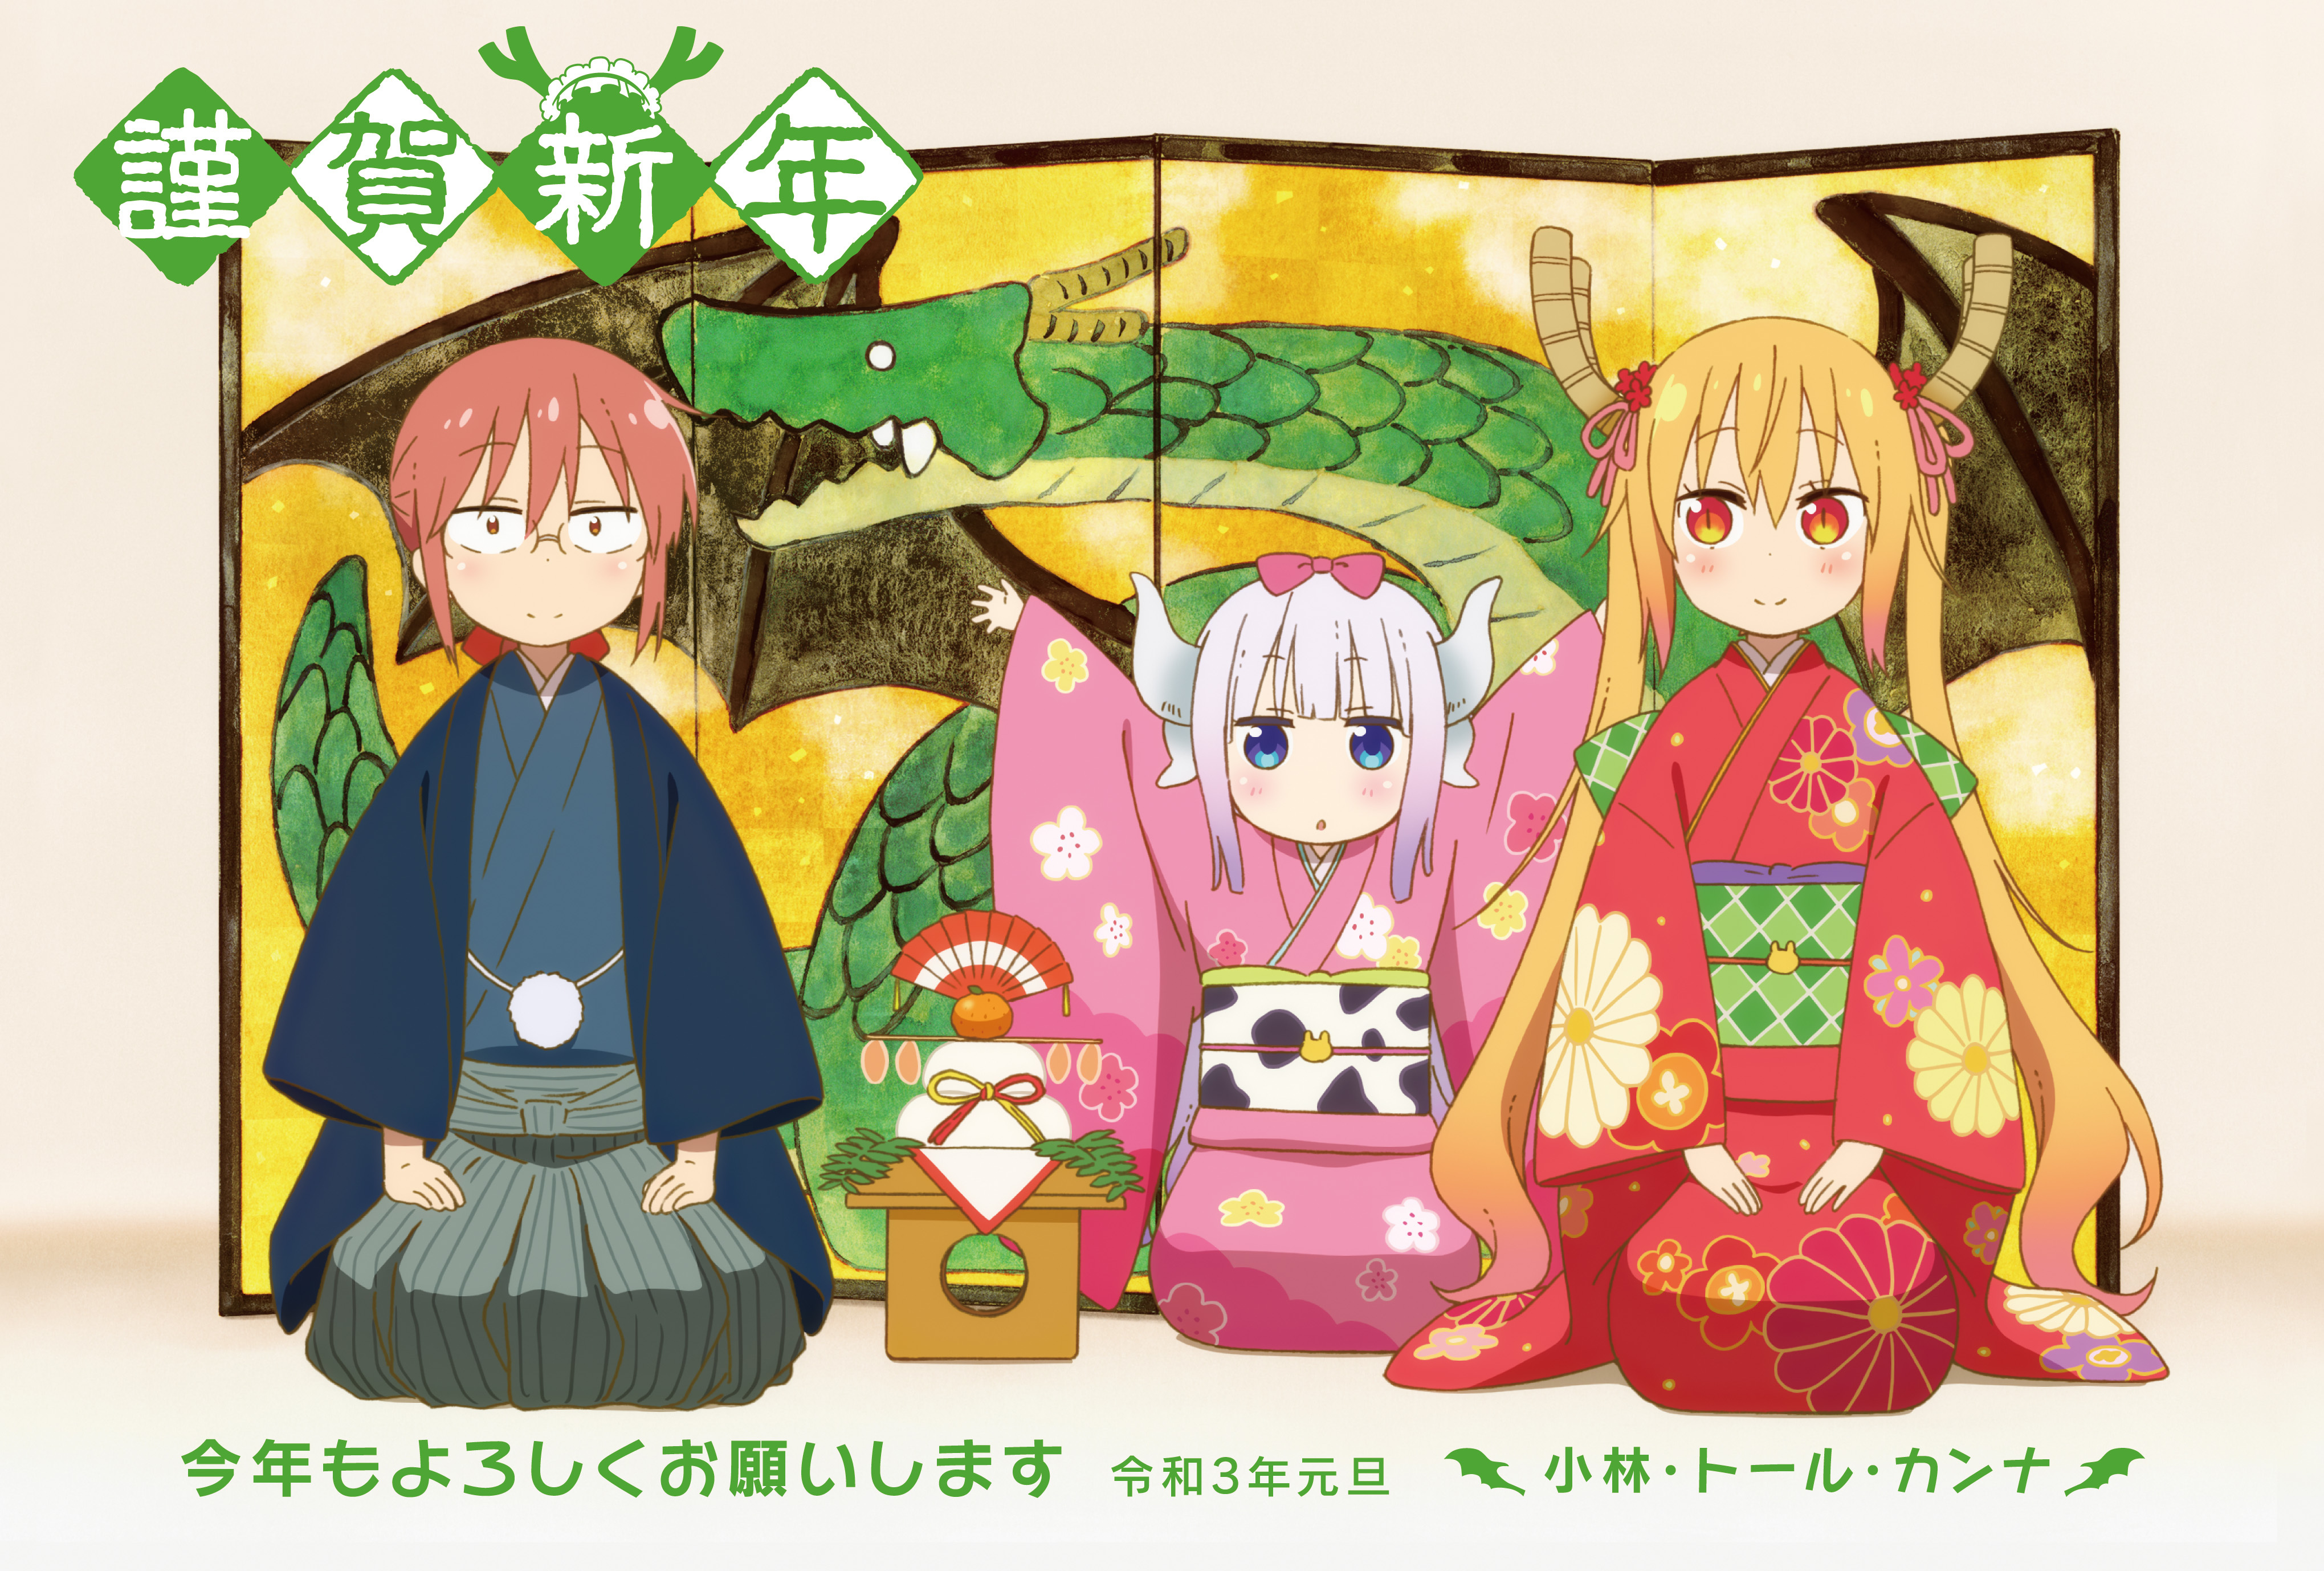 maidragon_anime 1344659720473198597_p0 (1)